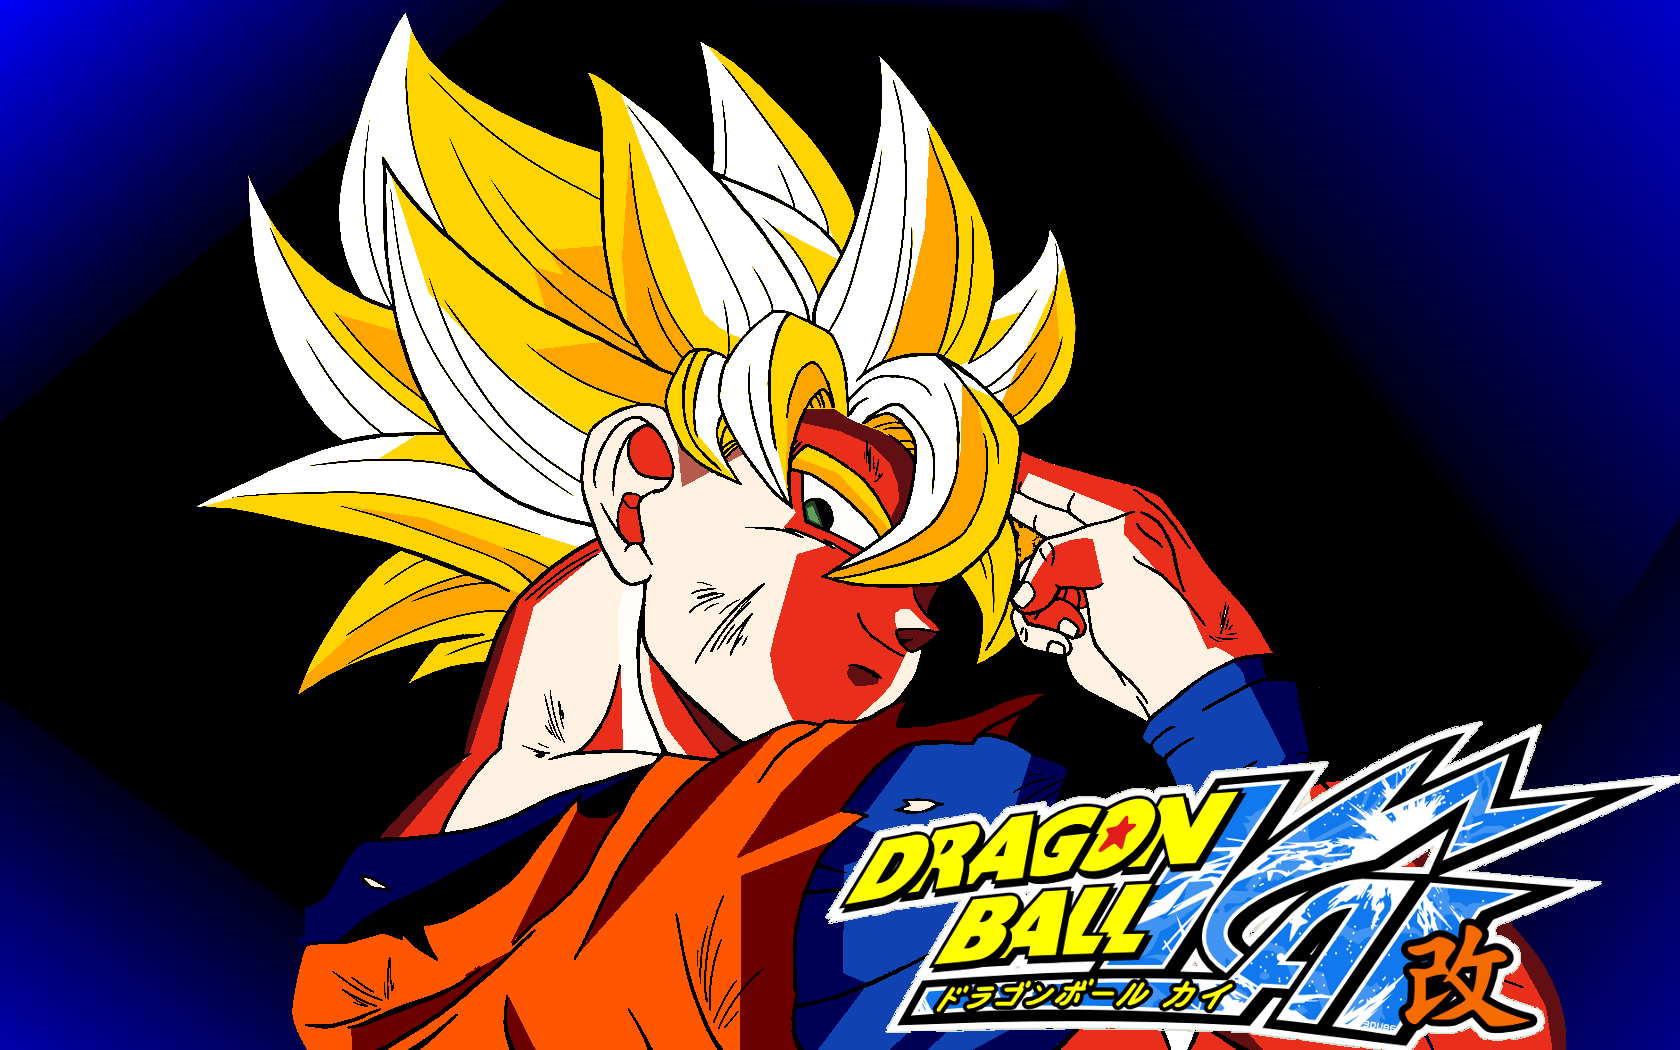 Goku 1 20super Saian Download: Dragon Ball Z Goku Super Saiyan 1 To 20 Wallpapers